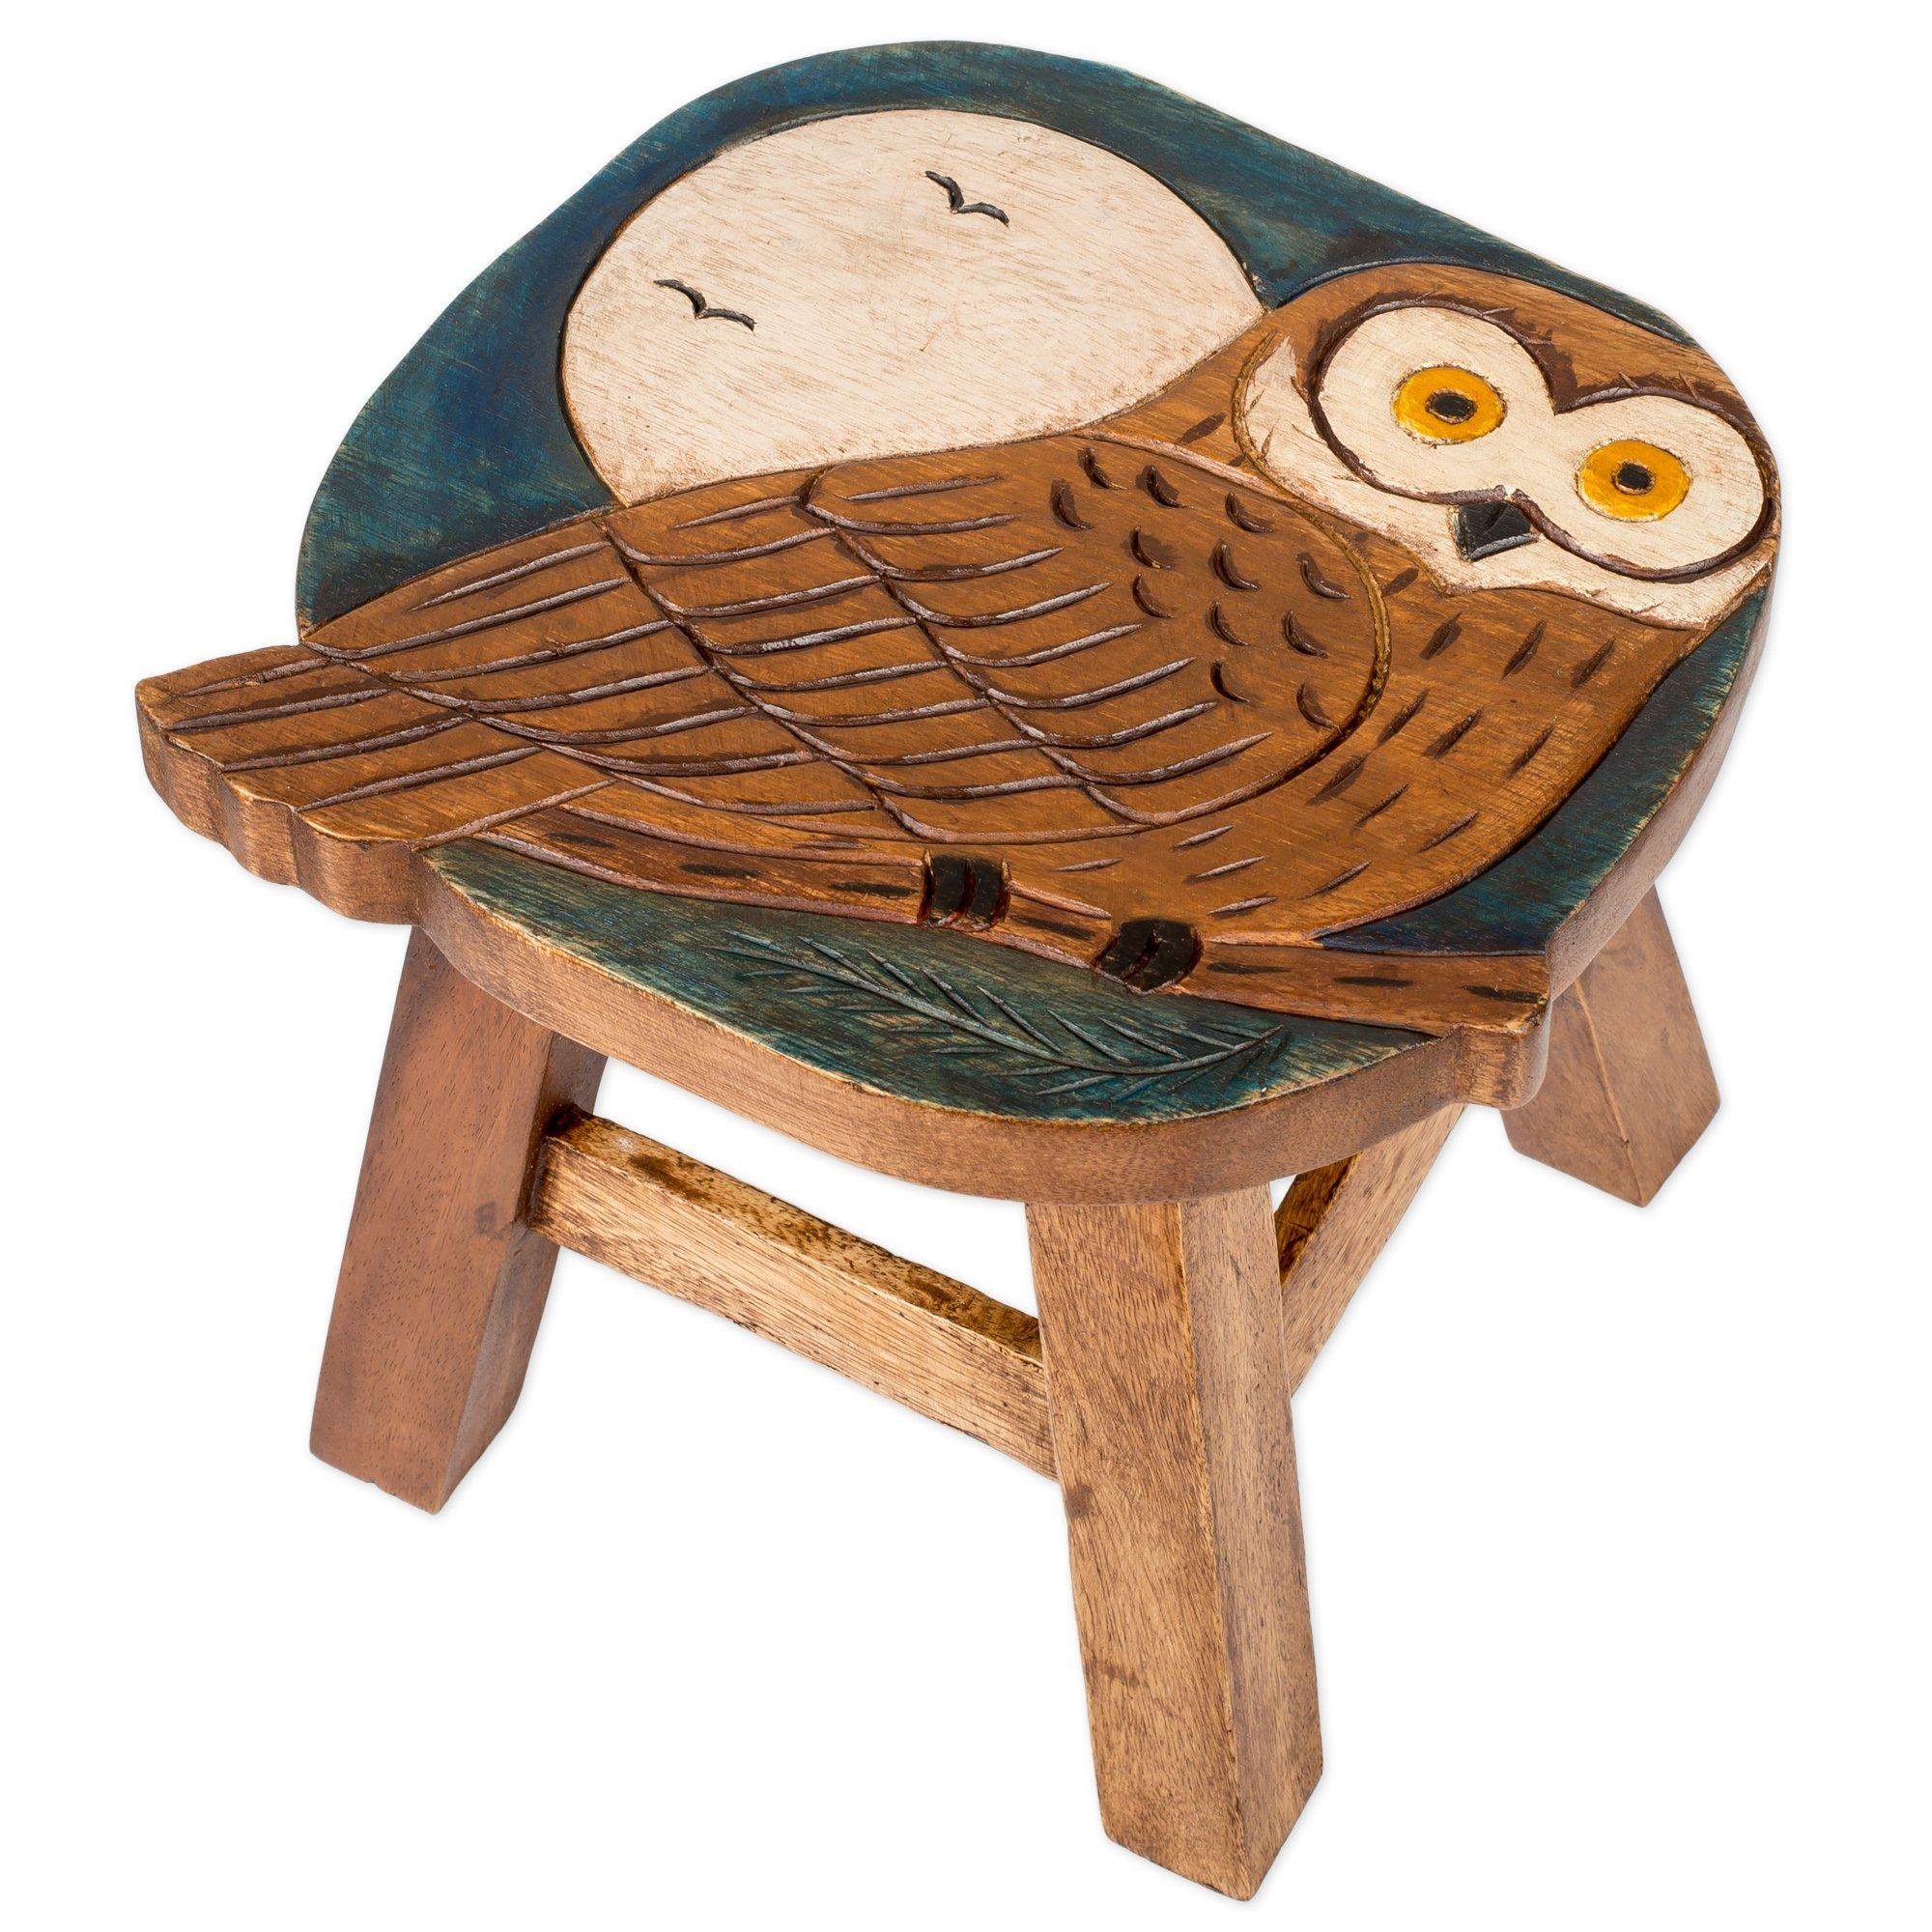 Owl Design Hand Carved Acacia Hardwood Decorative Short Stool by Sea Island Imports